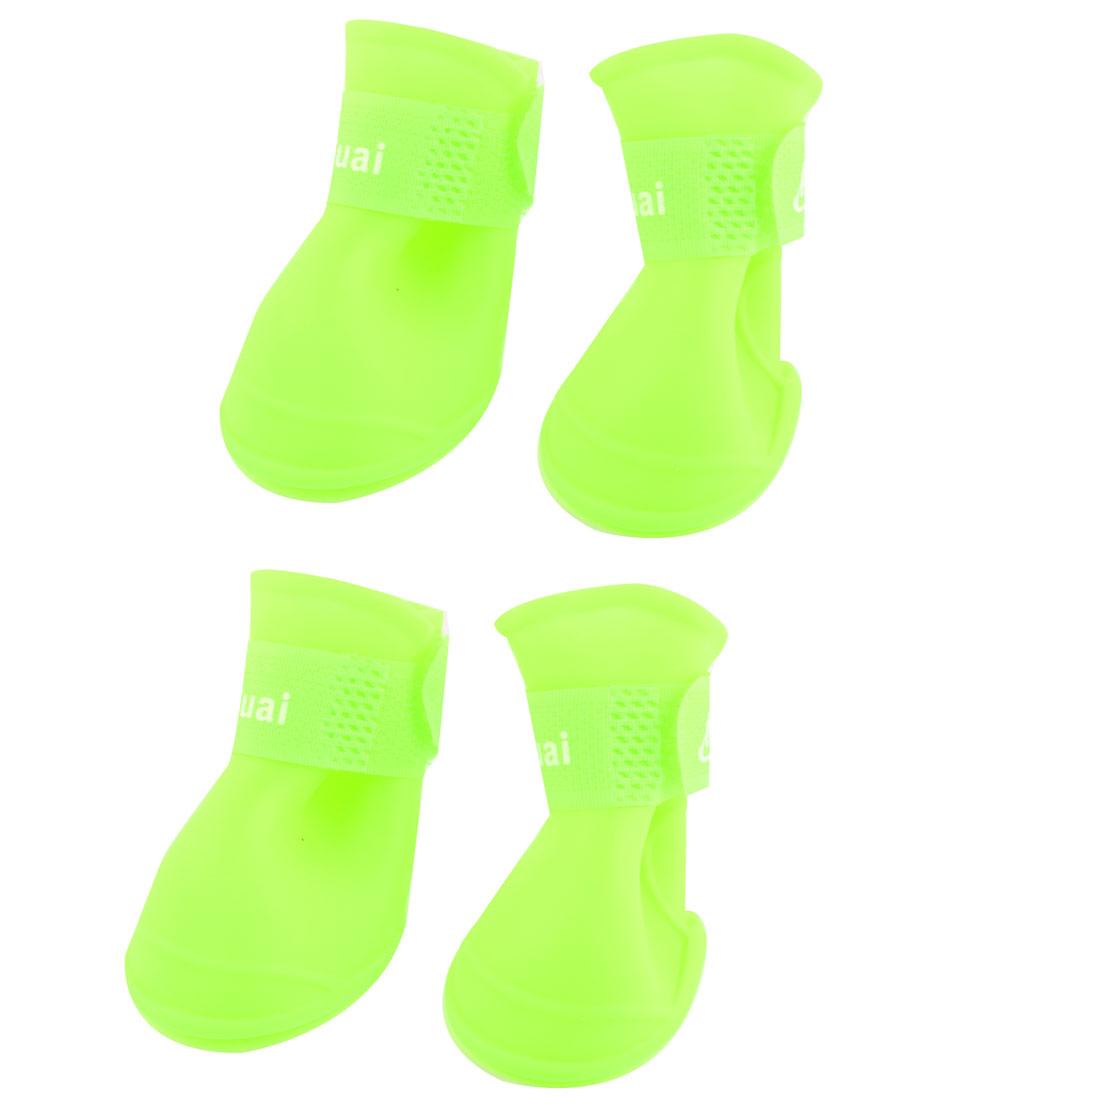 4pcs Rubber Hook Loop Closure Water Resistant Animal Pet Dog Shoes Foot Protector Yellow